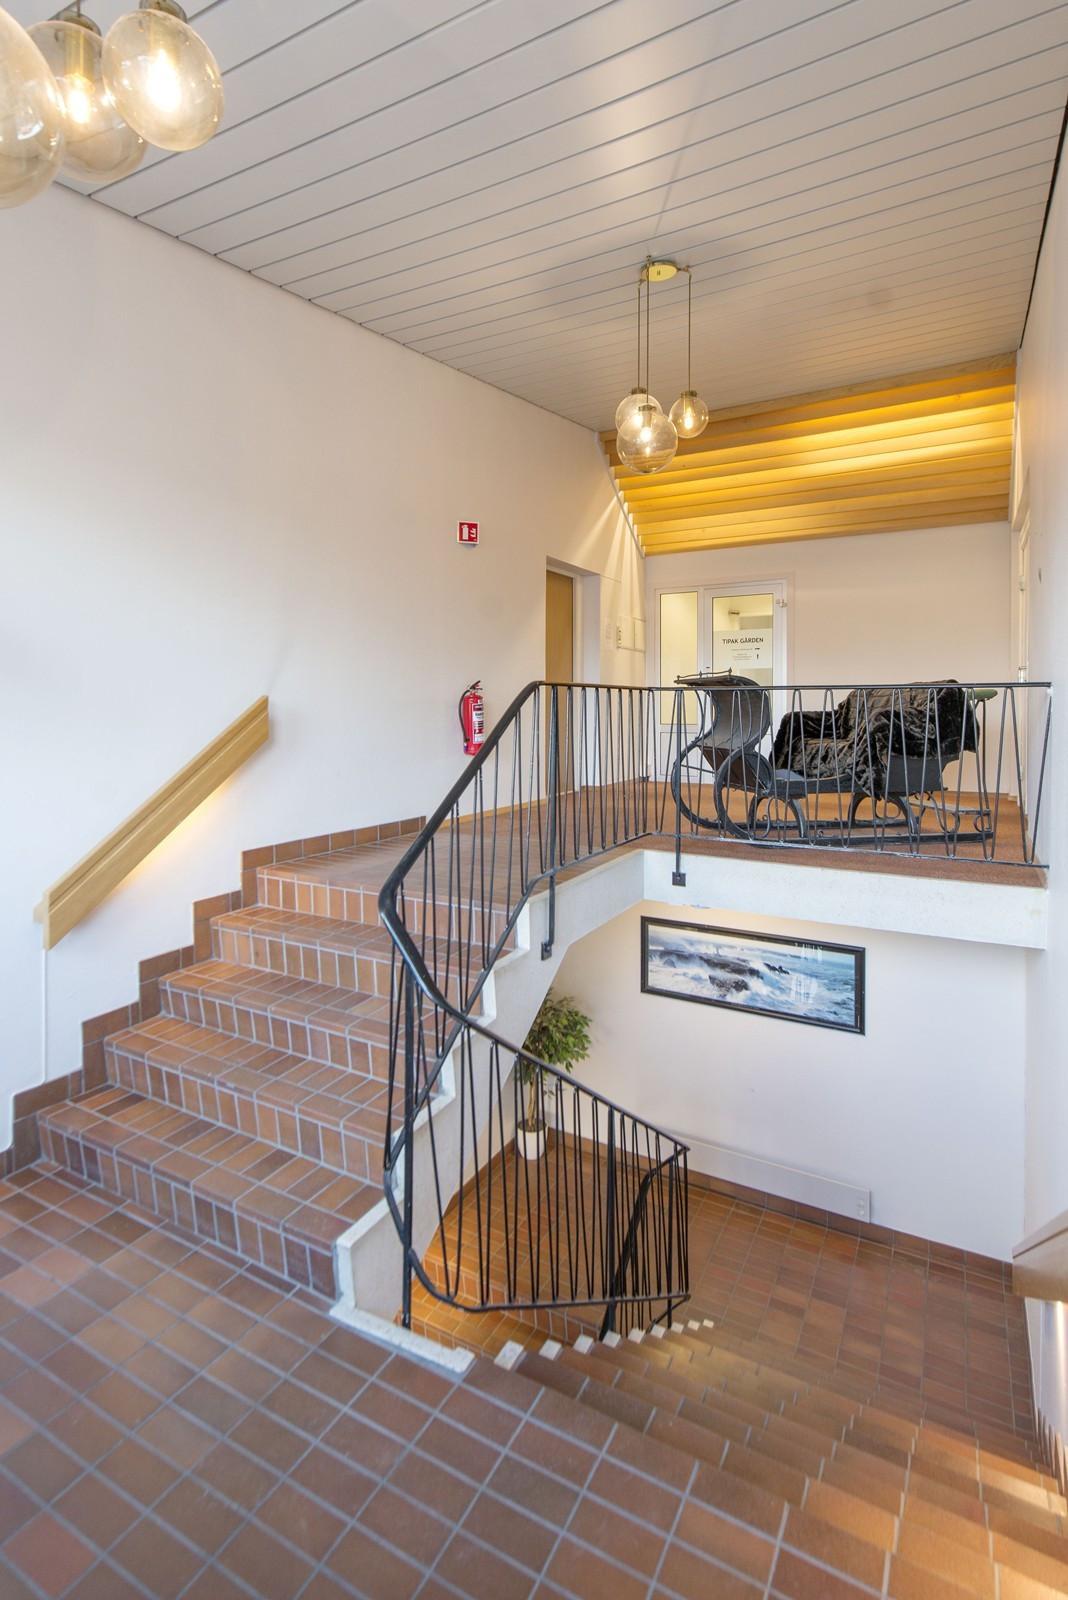 Innvendig trappeareal - hovedinngang kontor